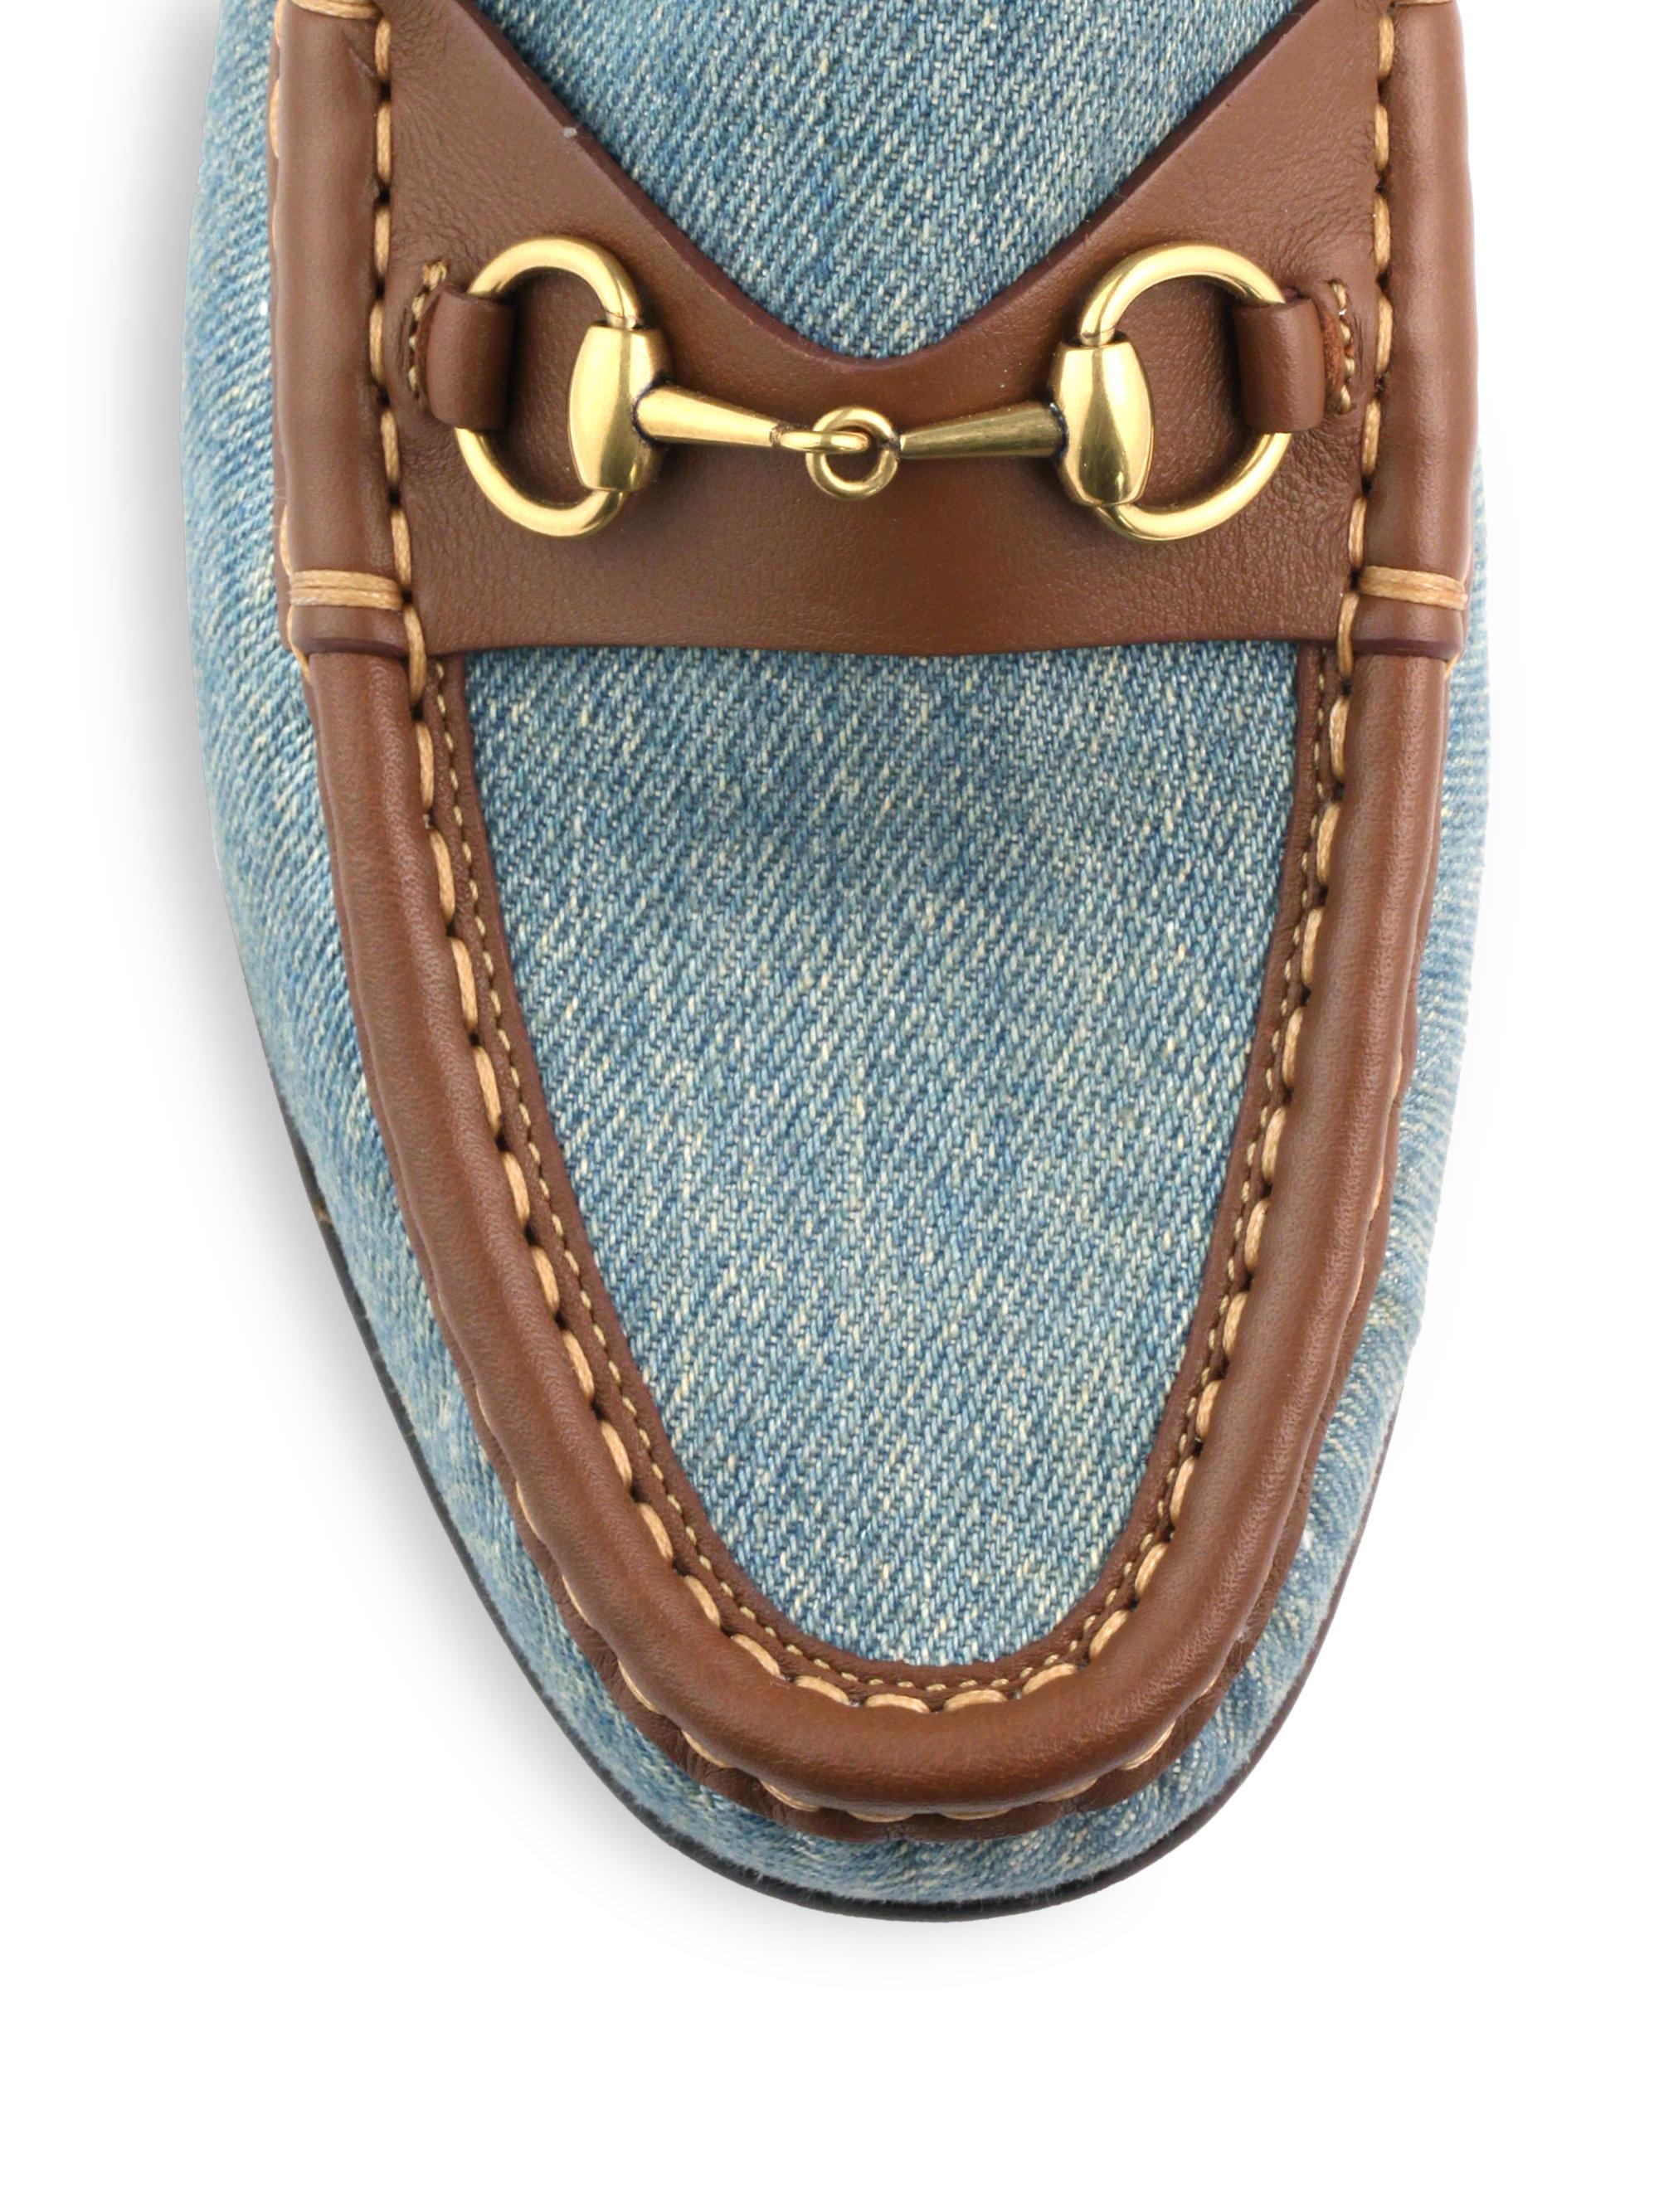 2eca2fd50a7 Lyst - Gucci Frame Denim Leather Horsebit Moccasin Loafers in Blue